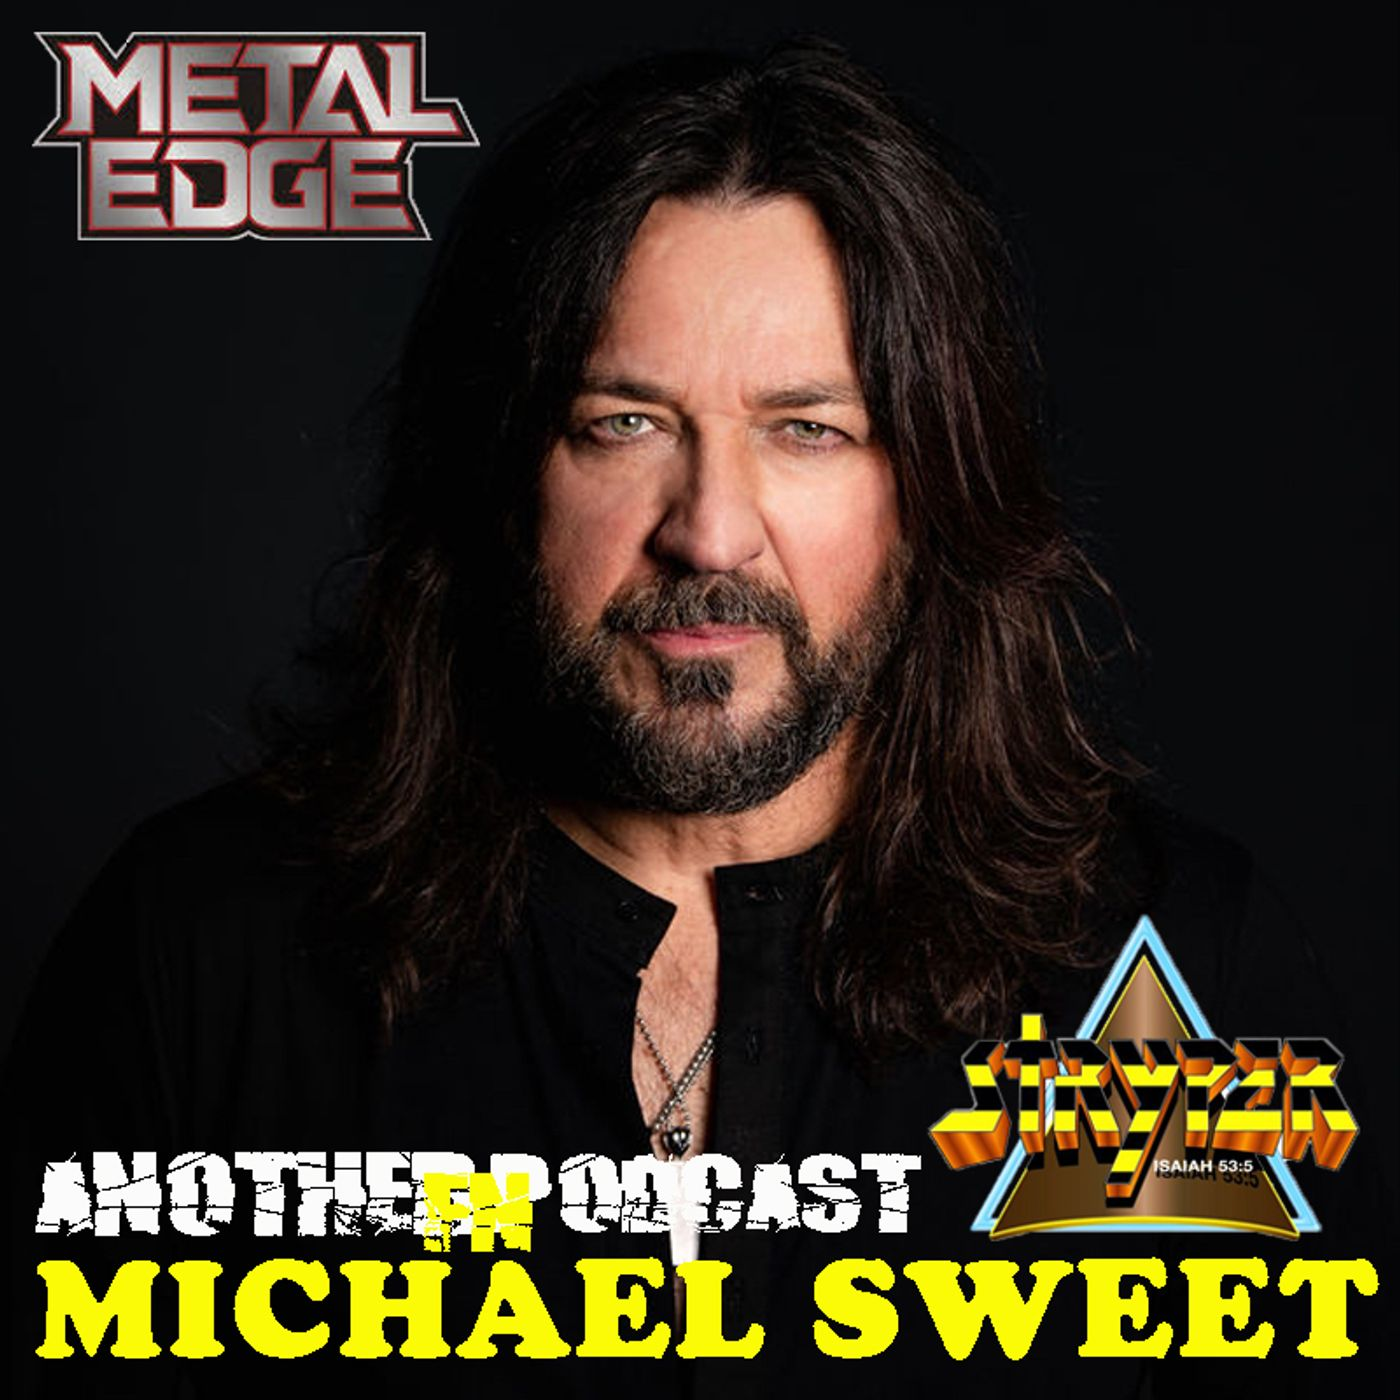 METAL EDGE MAGAZINE PRESENTS MICHAEL SWEET OF STRYPER